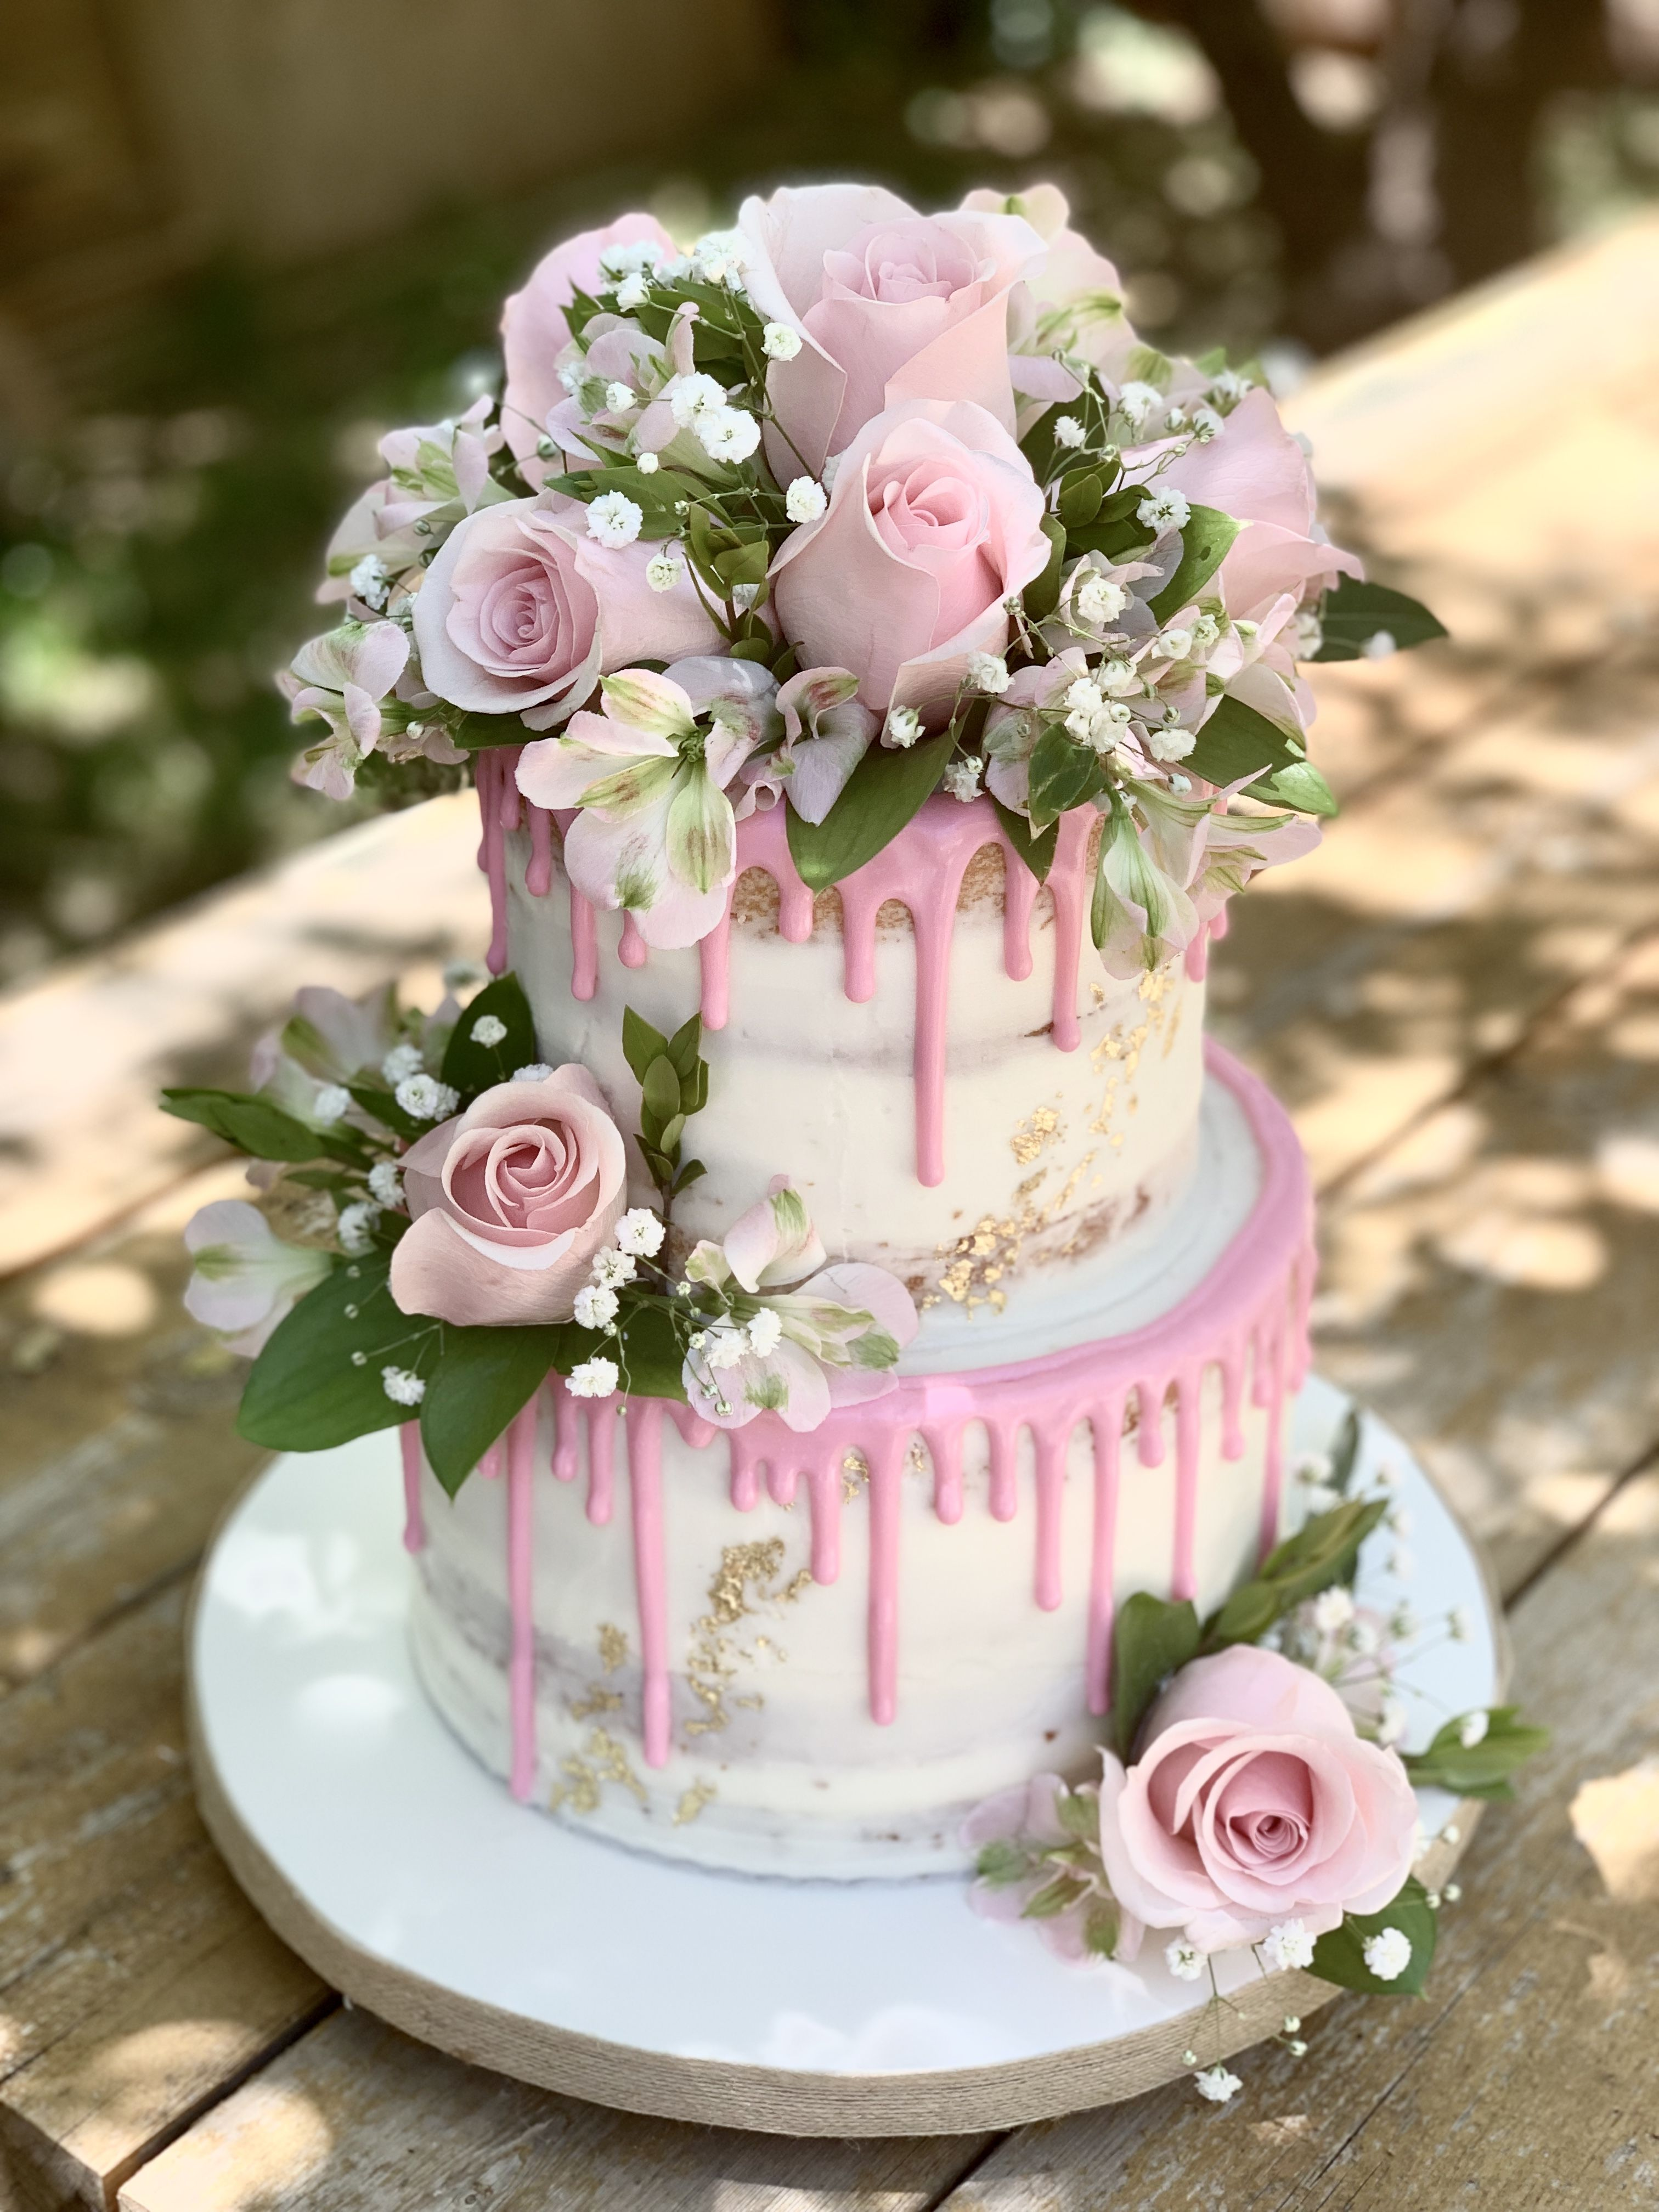 Tiz The Cake By Gigi Tiz   Cake, Baby shower cakes, Shower